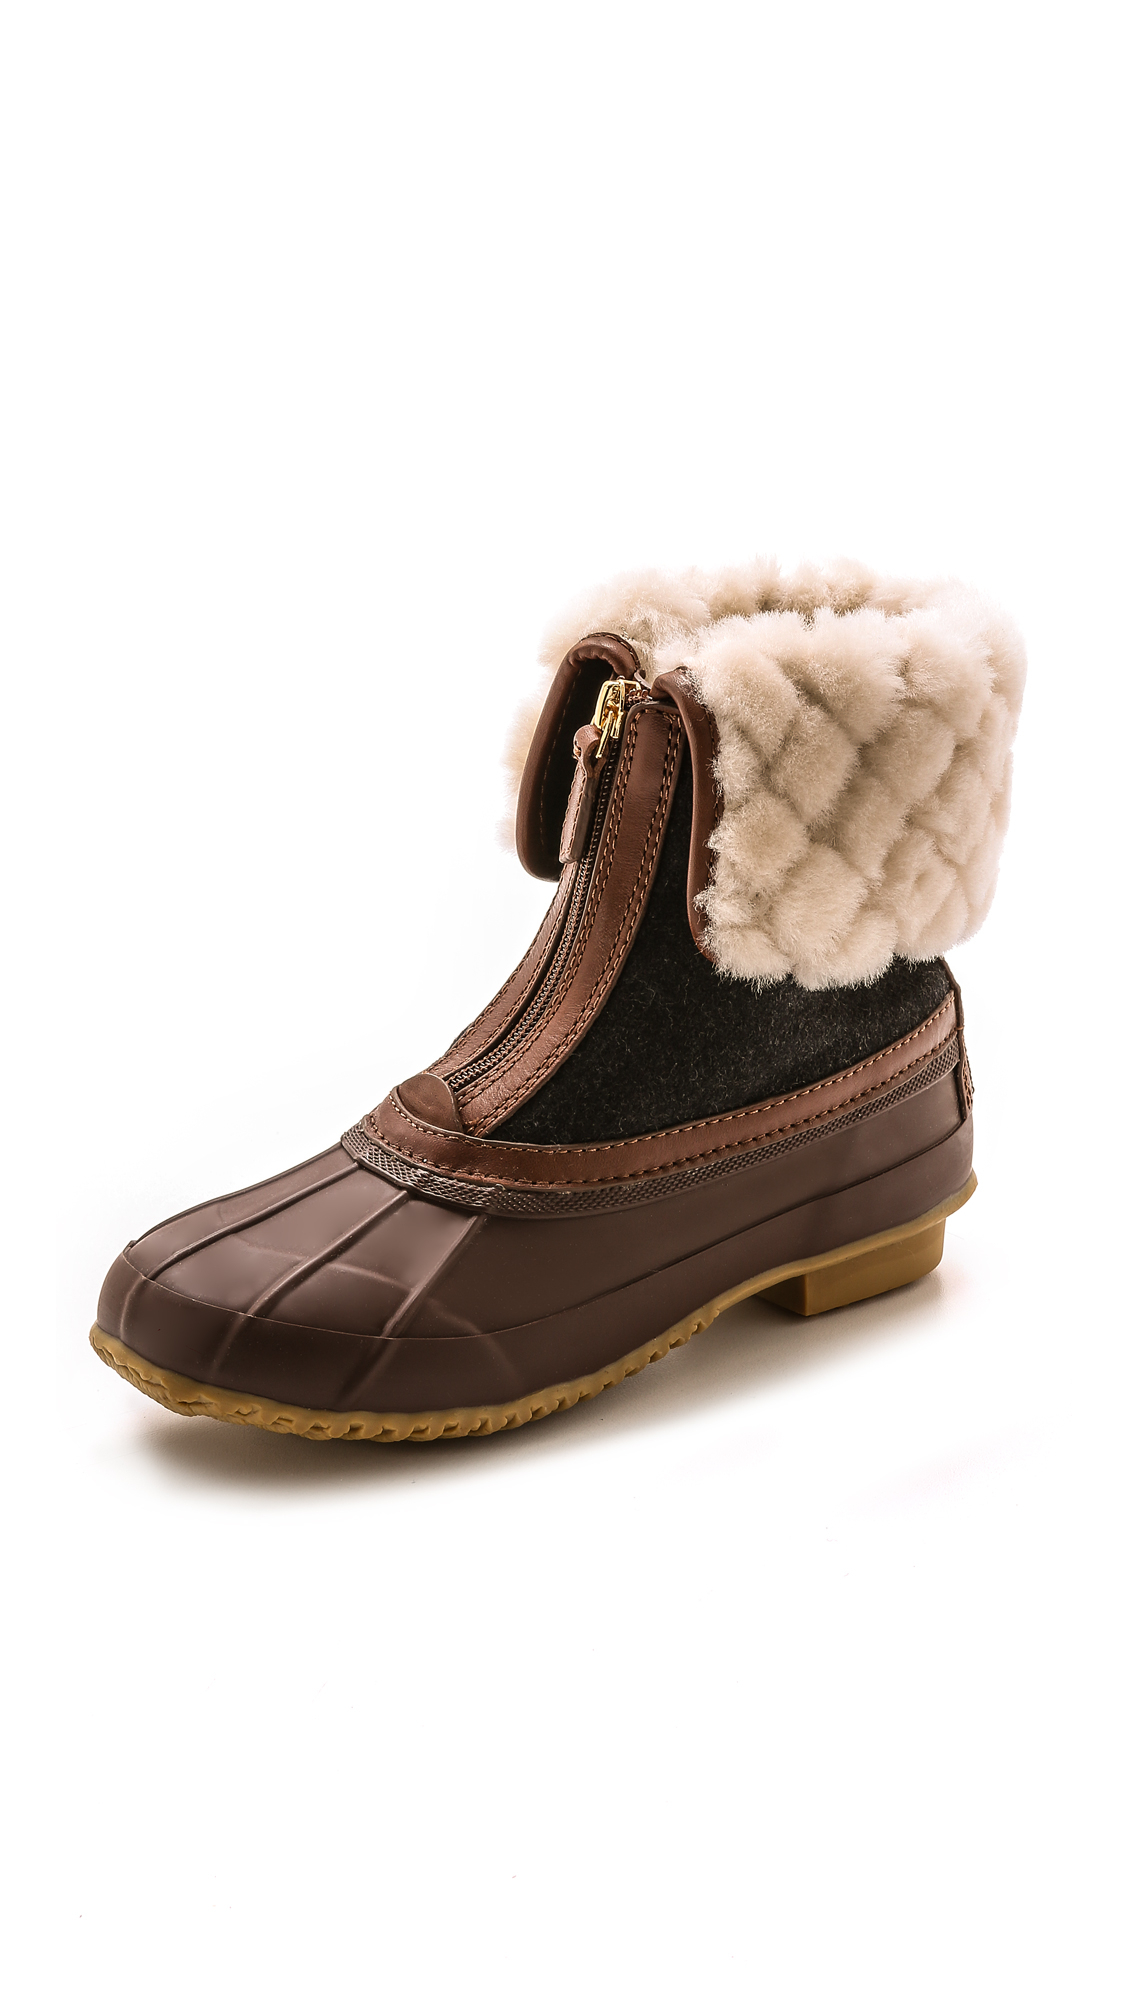 5ecfbb87b75 Tory Burch Abbott Shearling-Cuff Duck Boot in Brown - Lyst